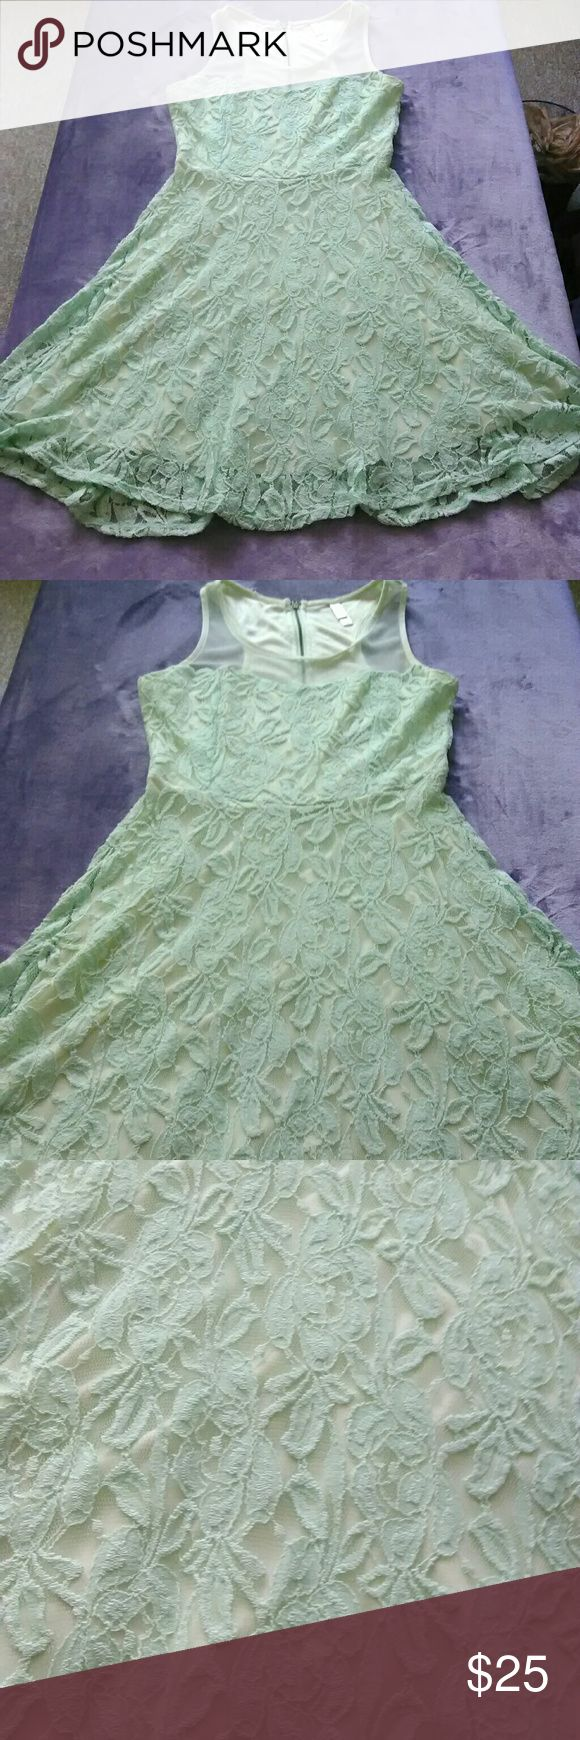 Blue green classic lace dress Blue greenish lace dress with zipper and slip Dresses Wedding